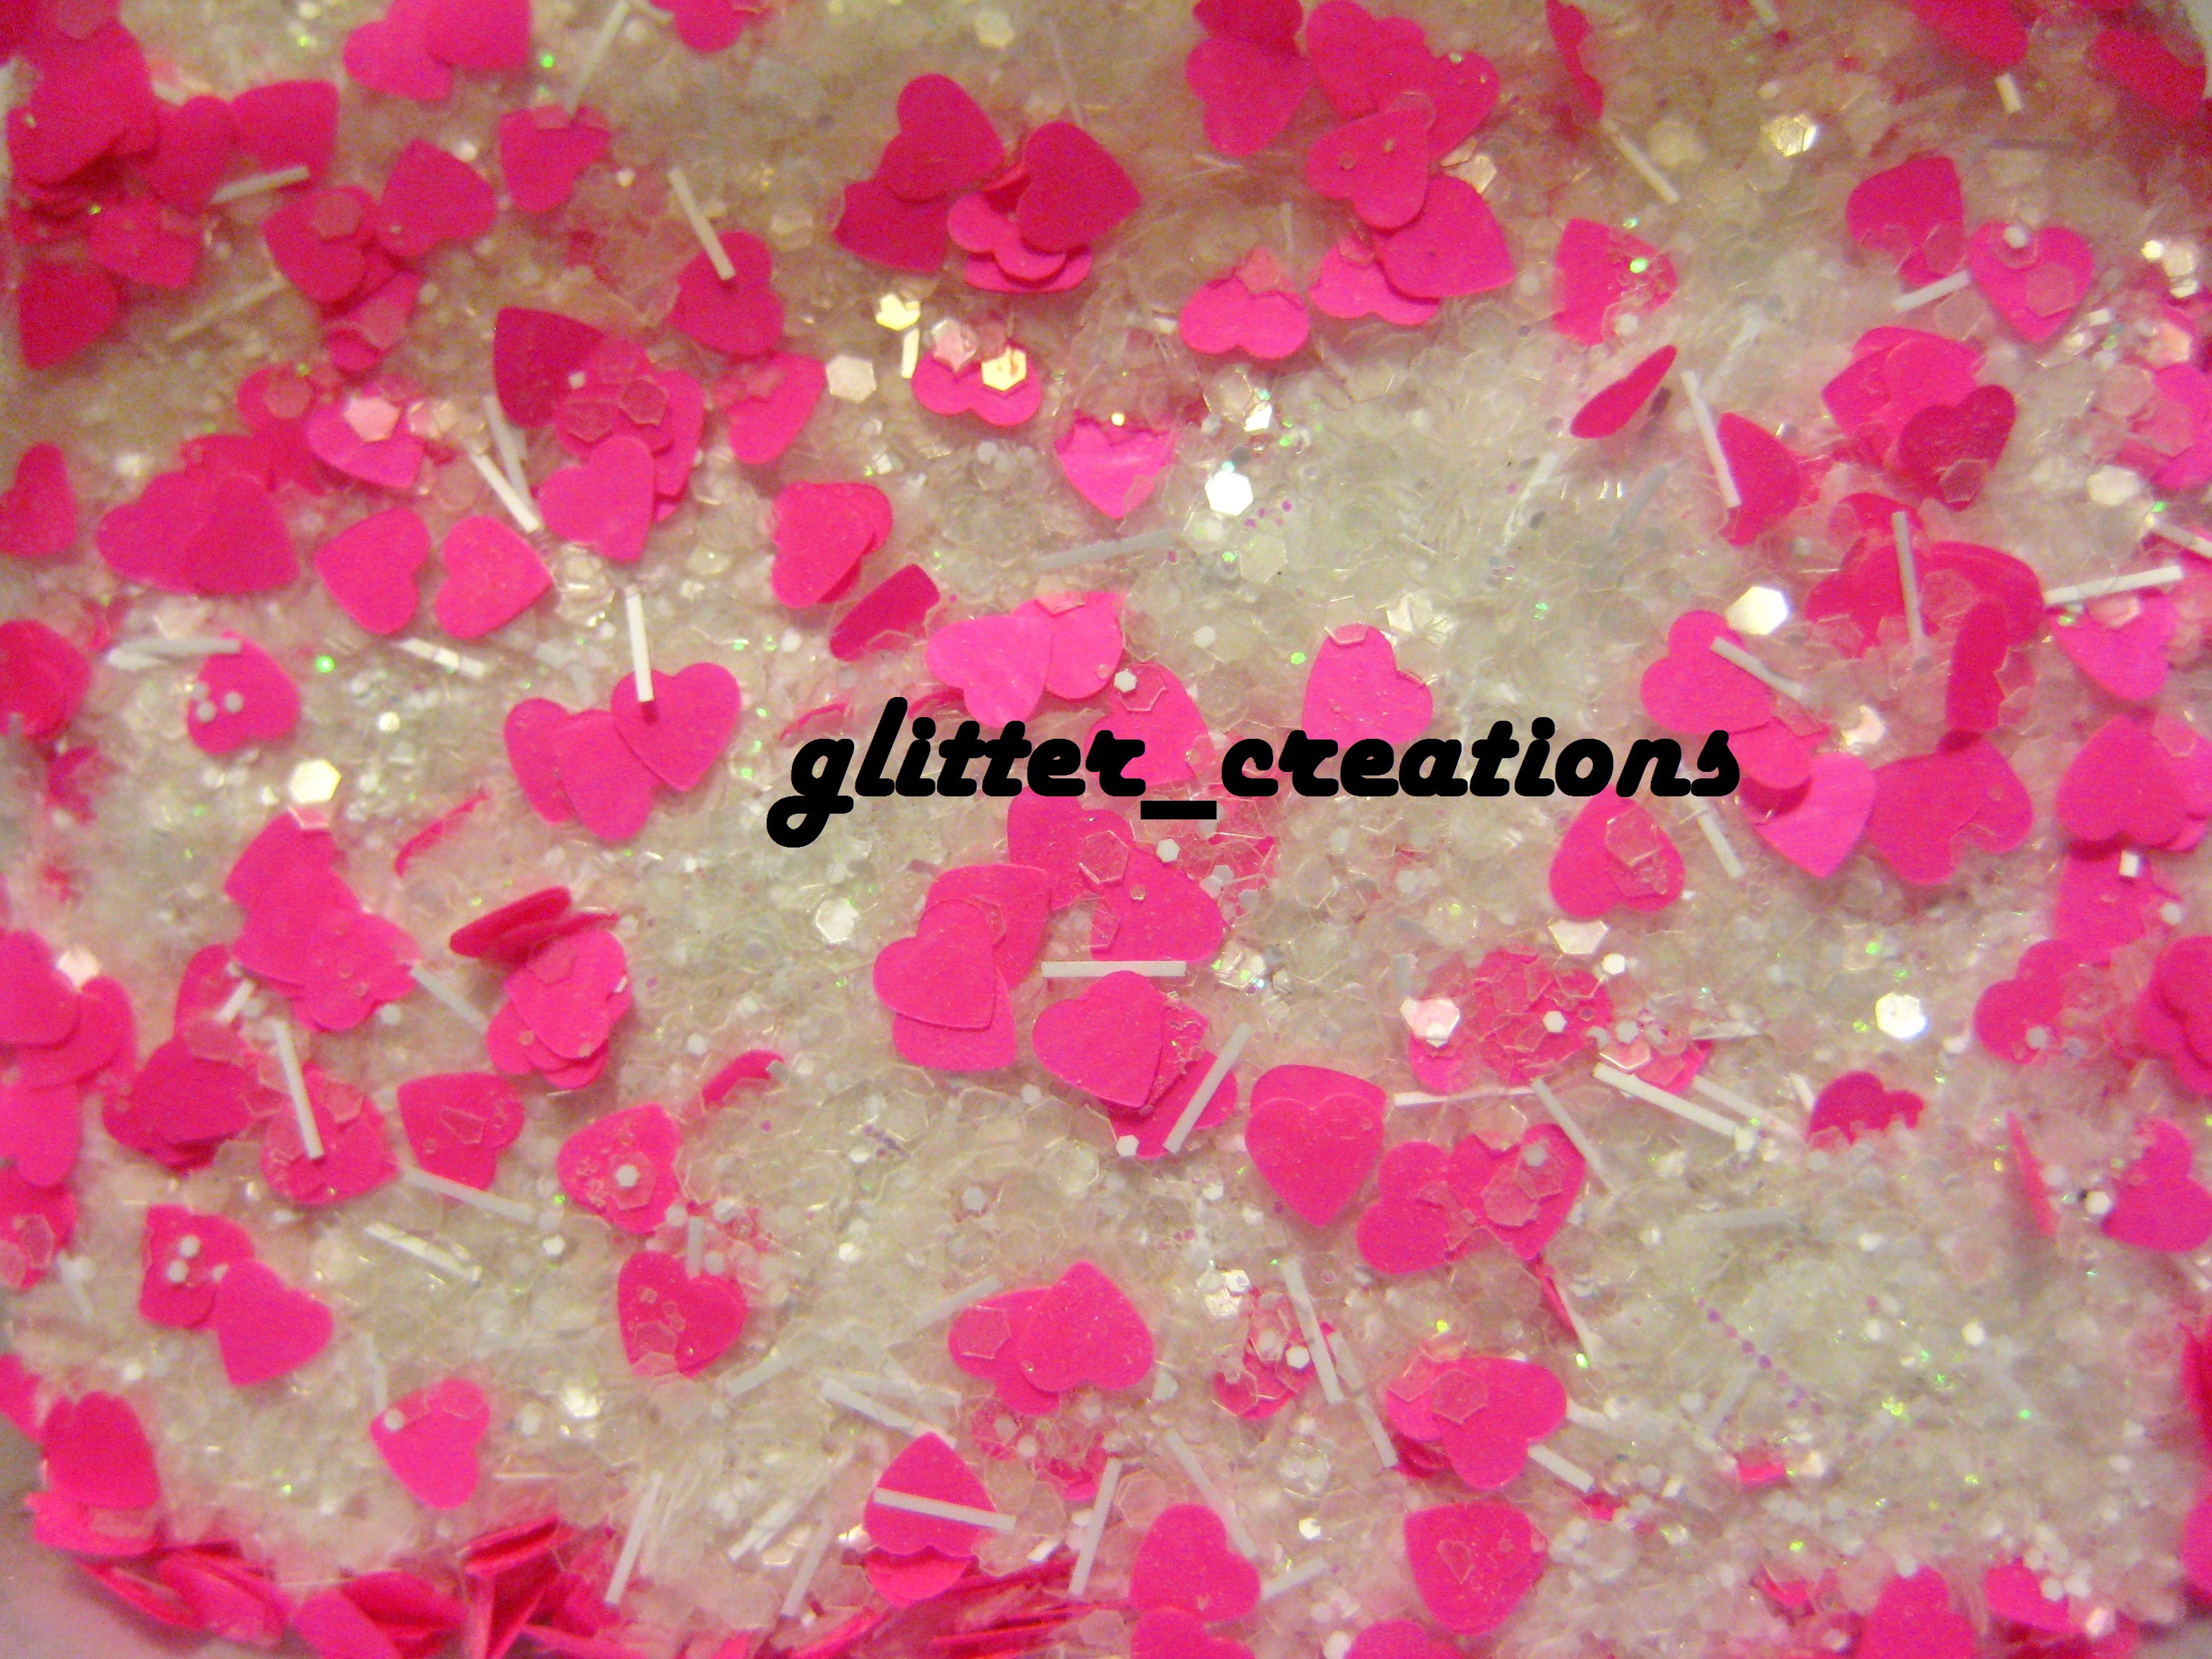 Nail Art Glitter Mix New Valentine Mix · glitter_creations · Online ...